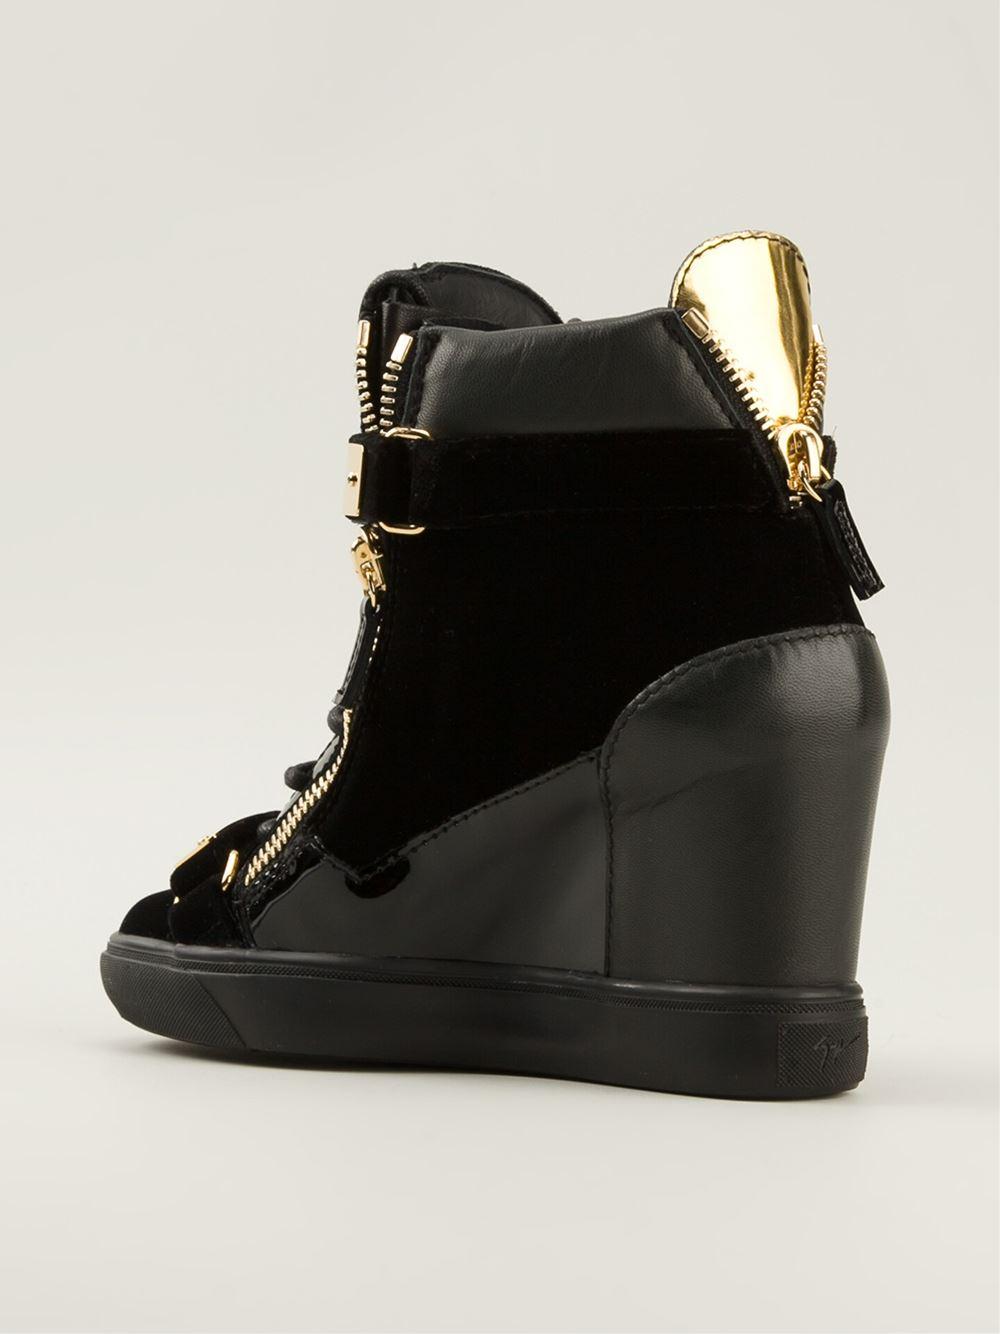 Giuseppe zanotti Golden Strap Wedge Sneakers in Black | Lyst